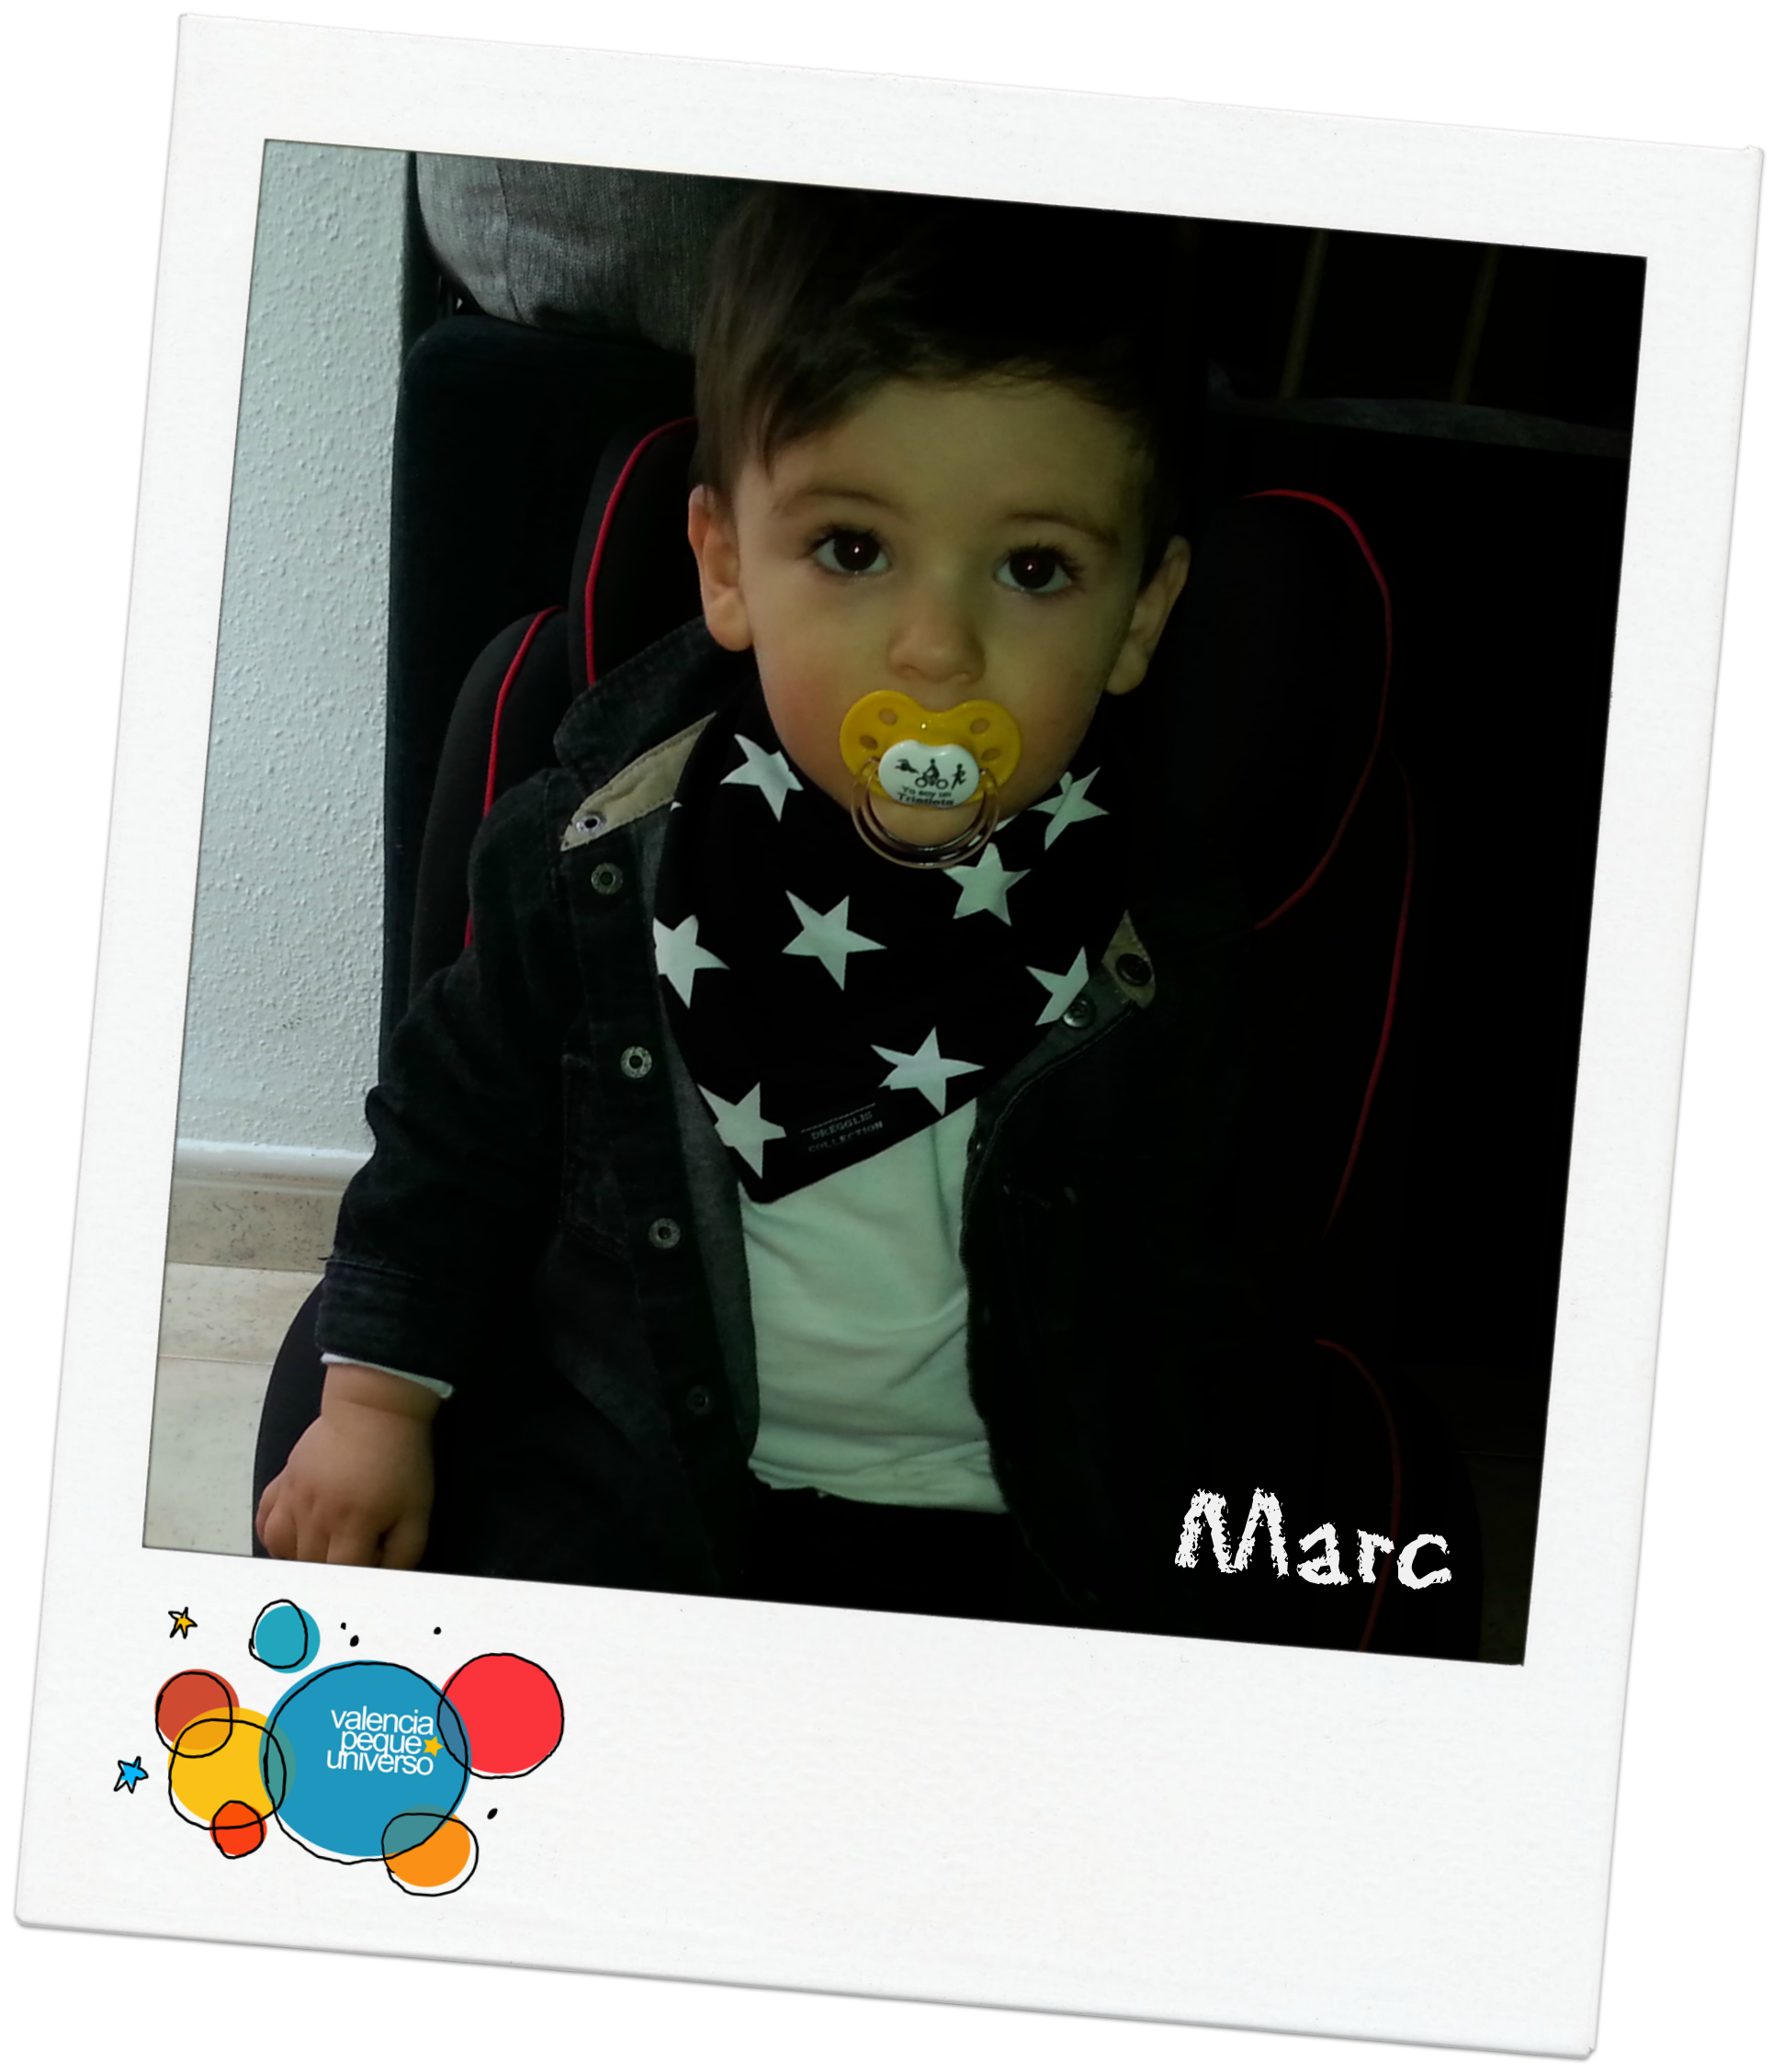 Marc 2